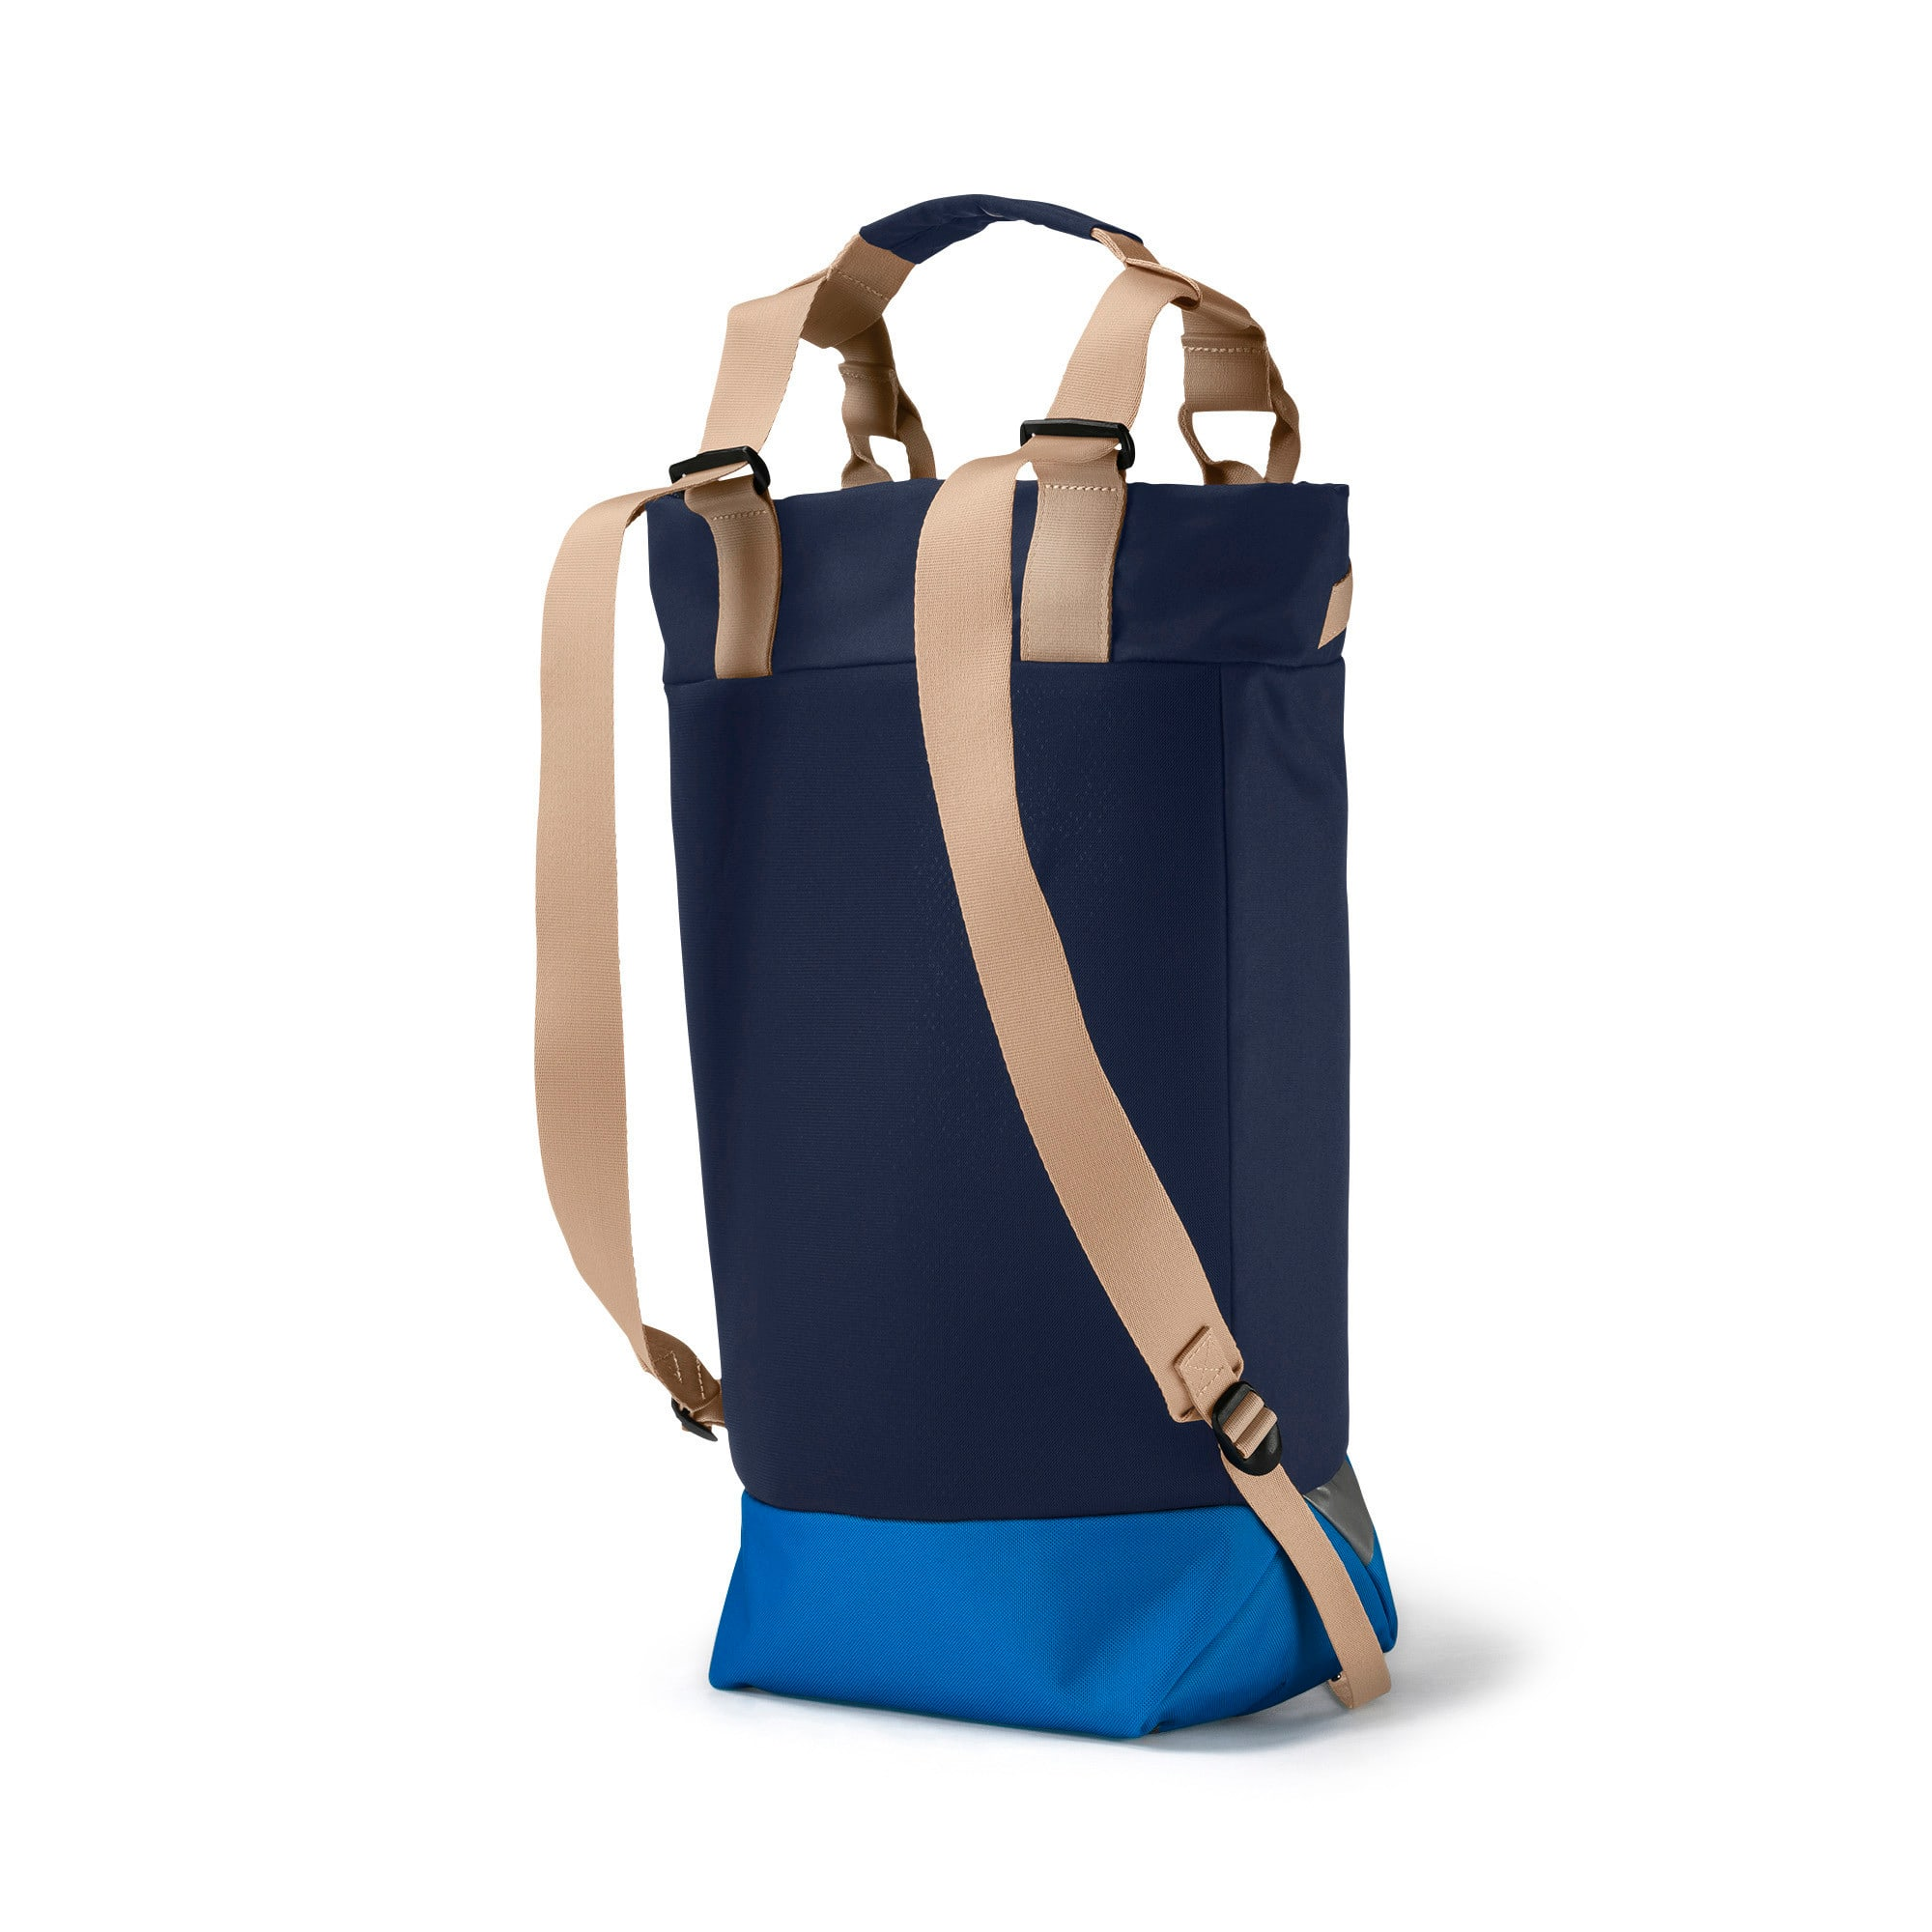 Thumbnail 2 of Olympique de Marseille Premium Tote Backpack, Peacoat-Bleu Azur-Beige, medium-IND